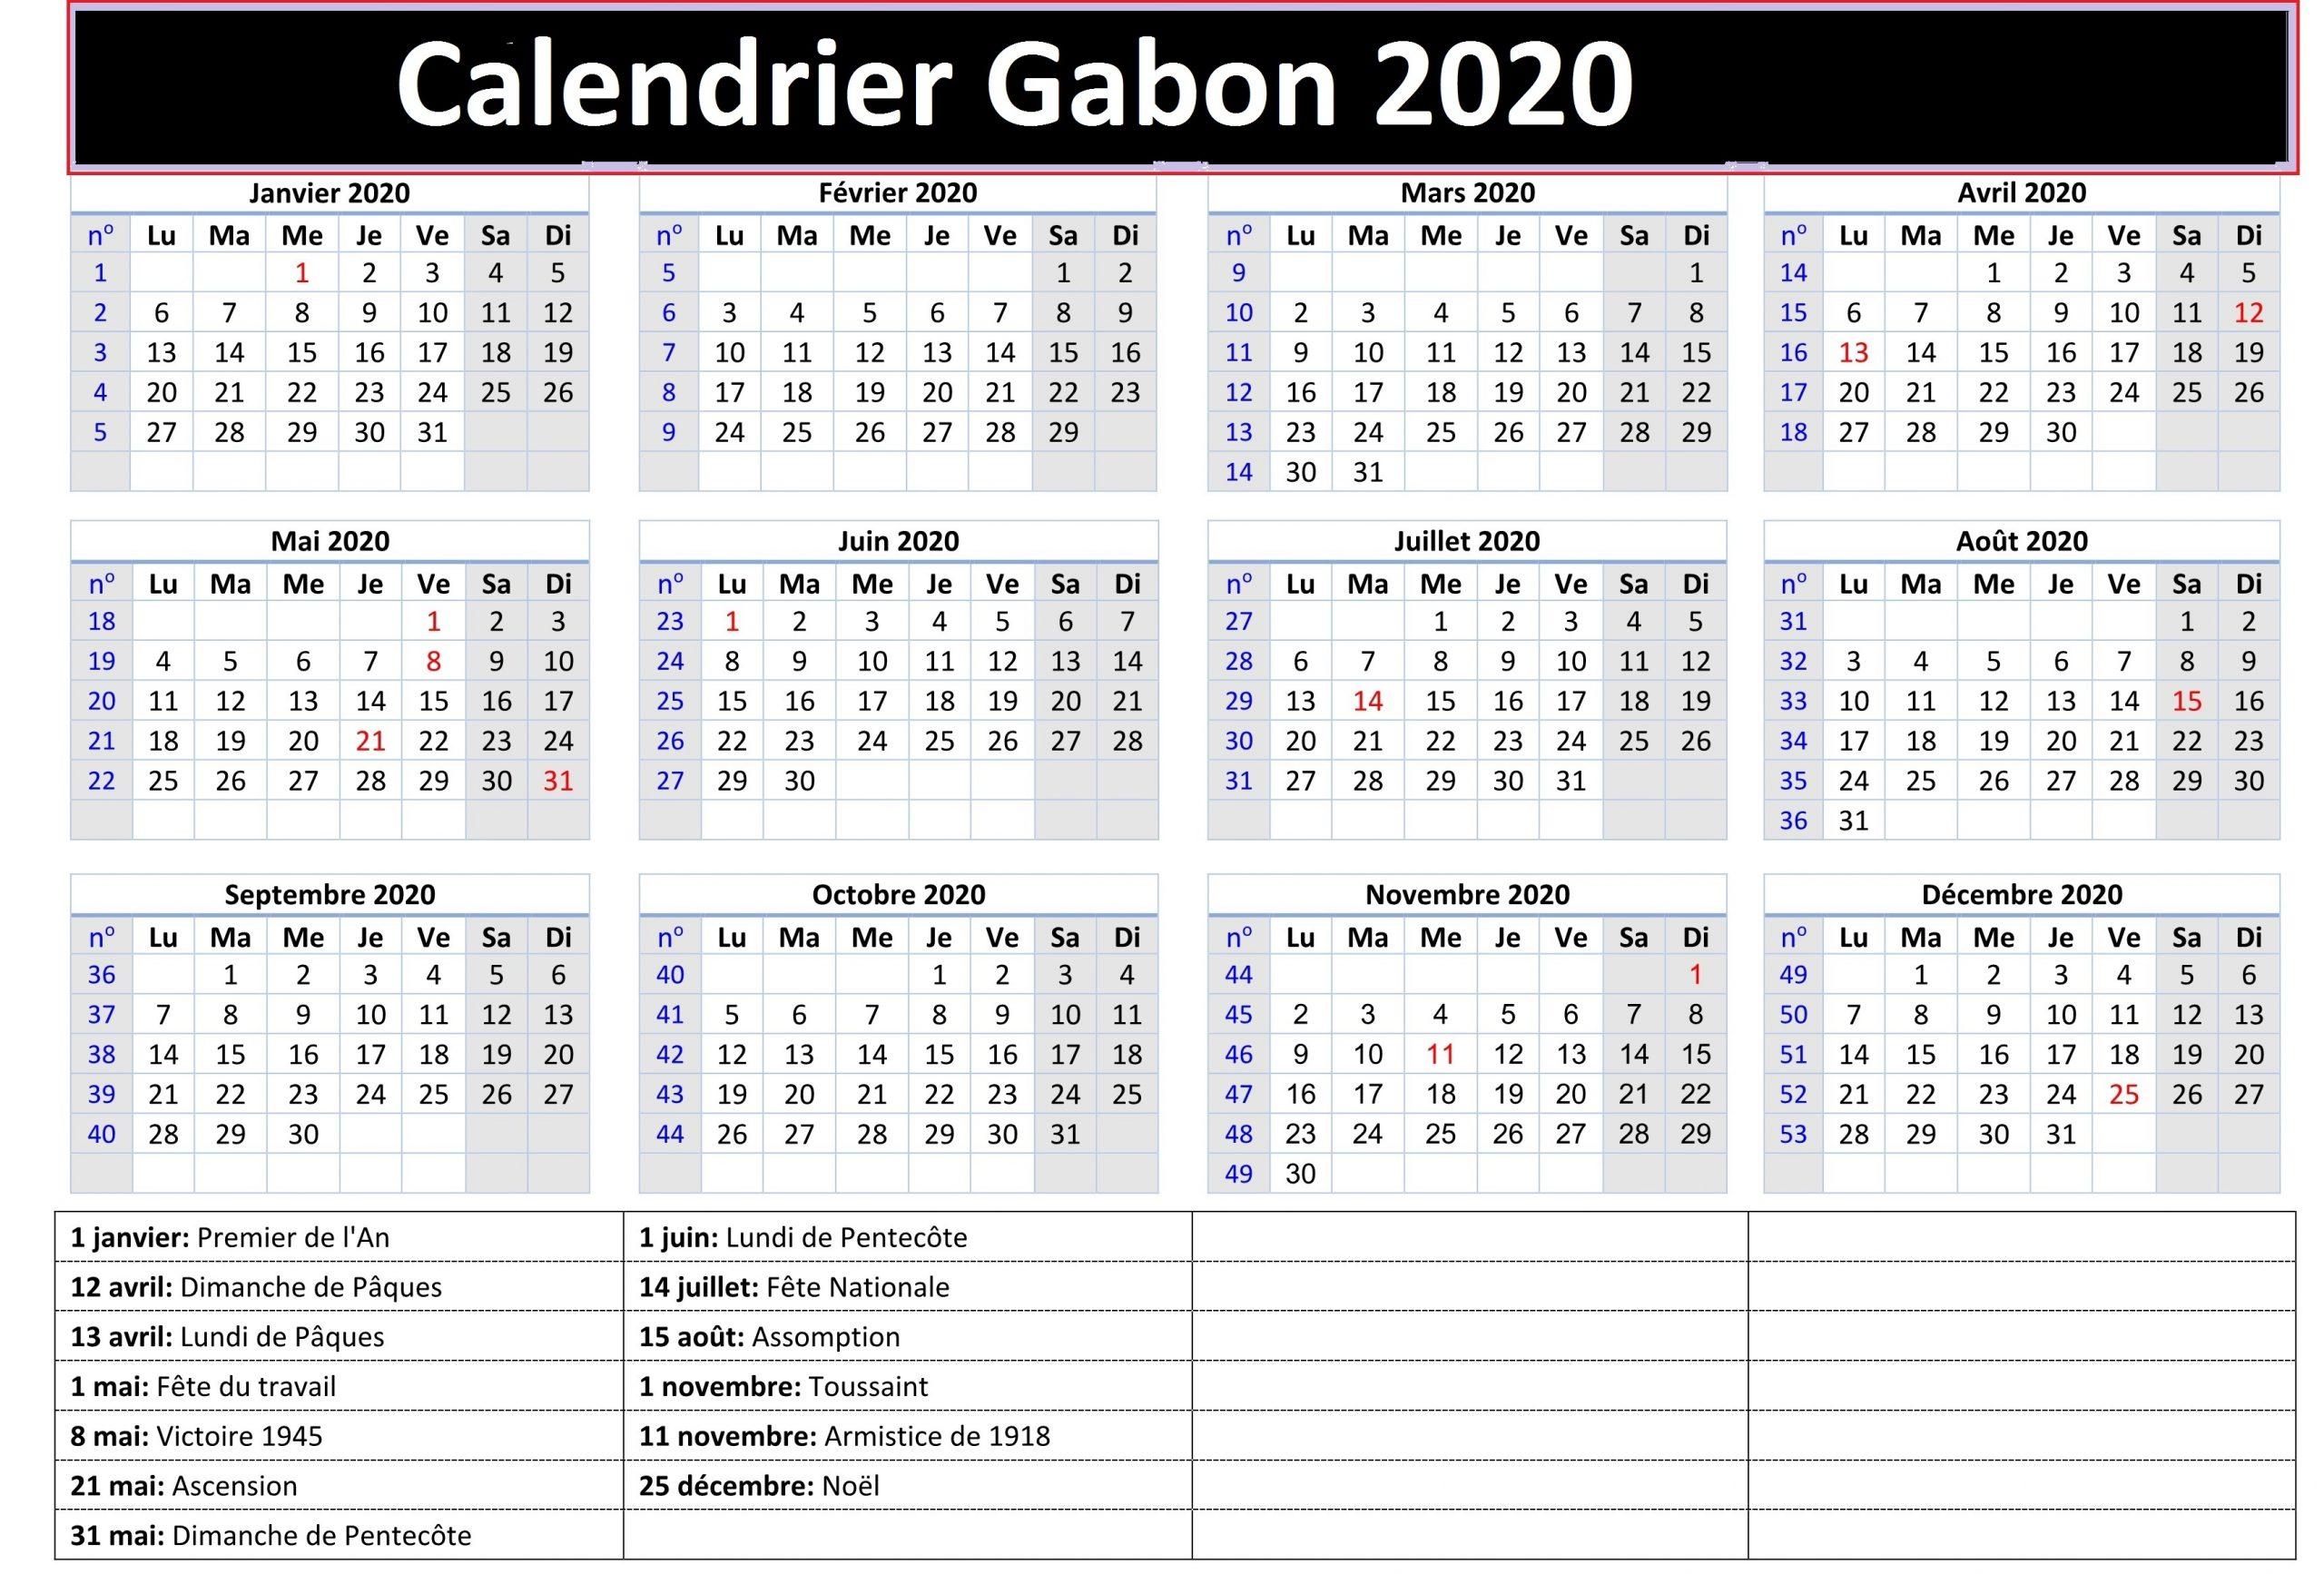 Calendrier Scolaire 2020 Gabon pdf